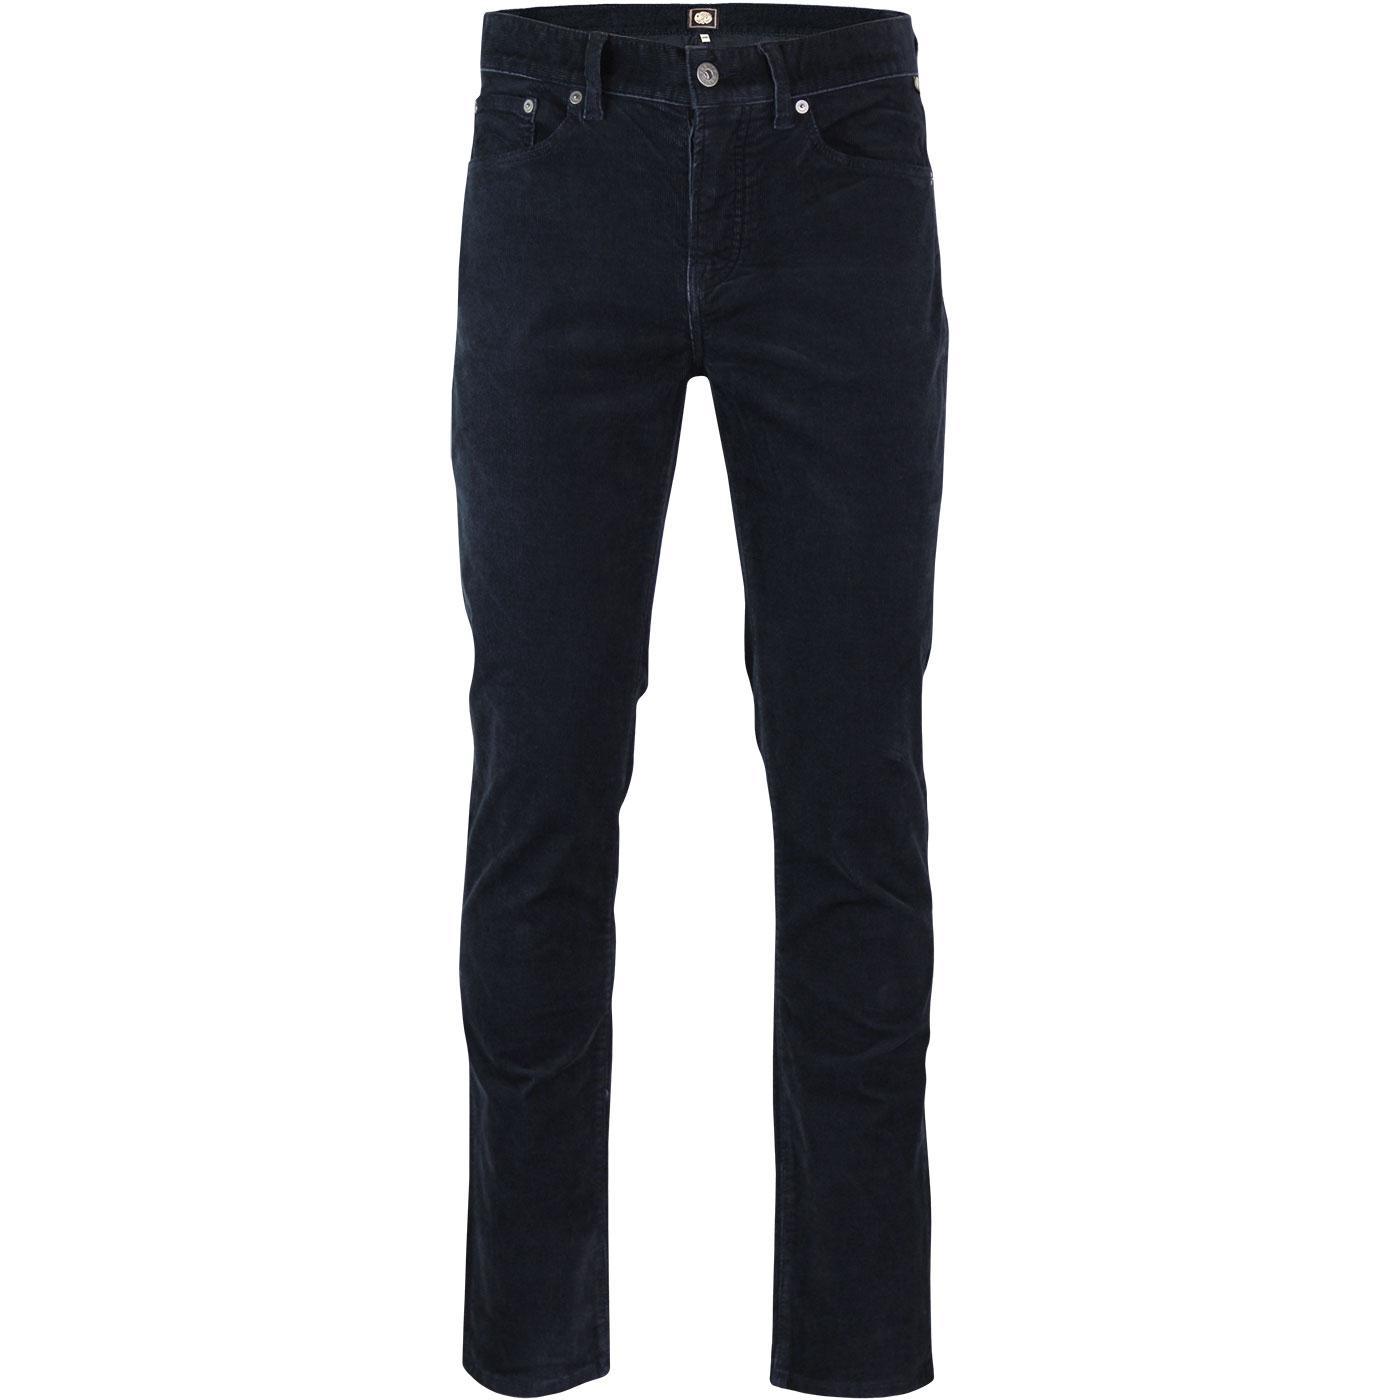 Alastair PRETTY GREEN Men's Retro Slim  Cord Jeans